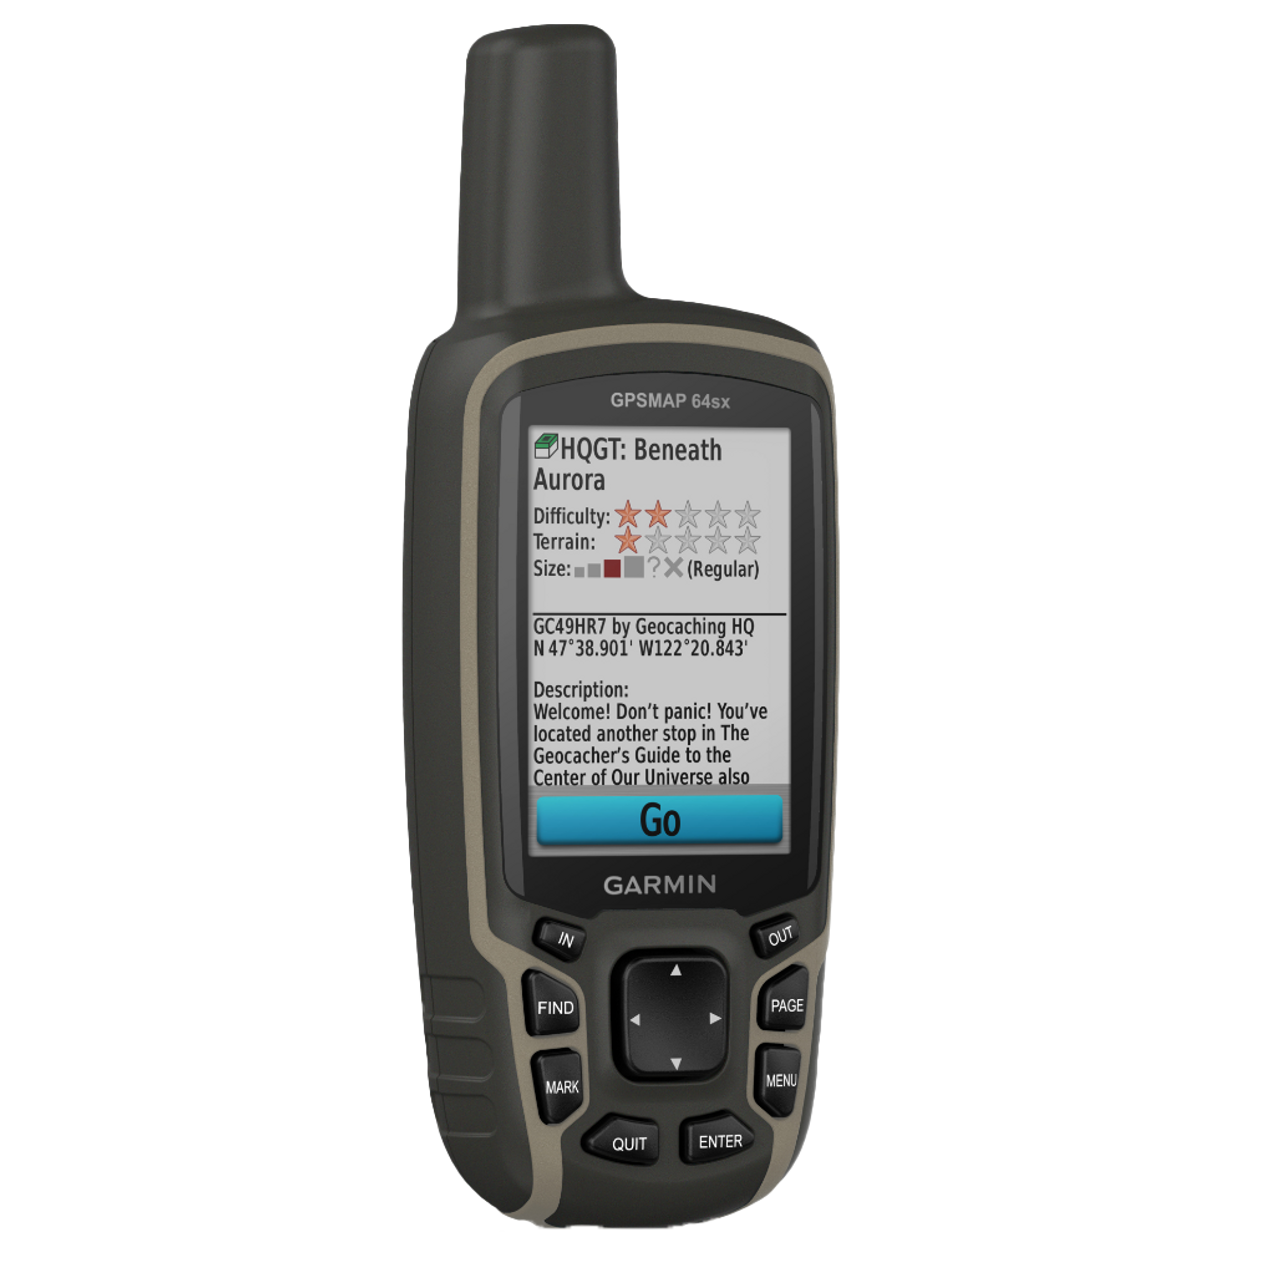 Garmin GPSMAP 64sx GPS